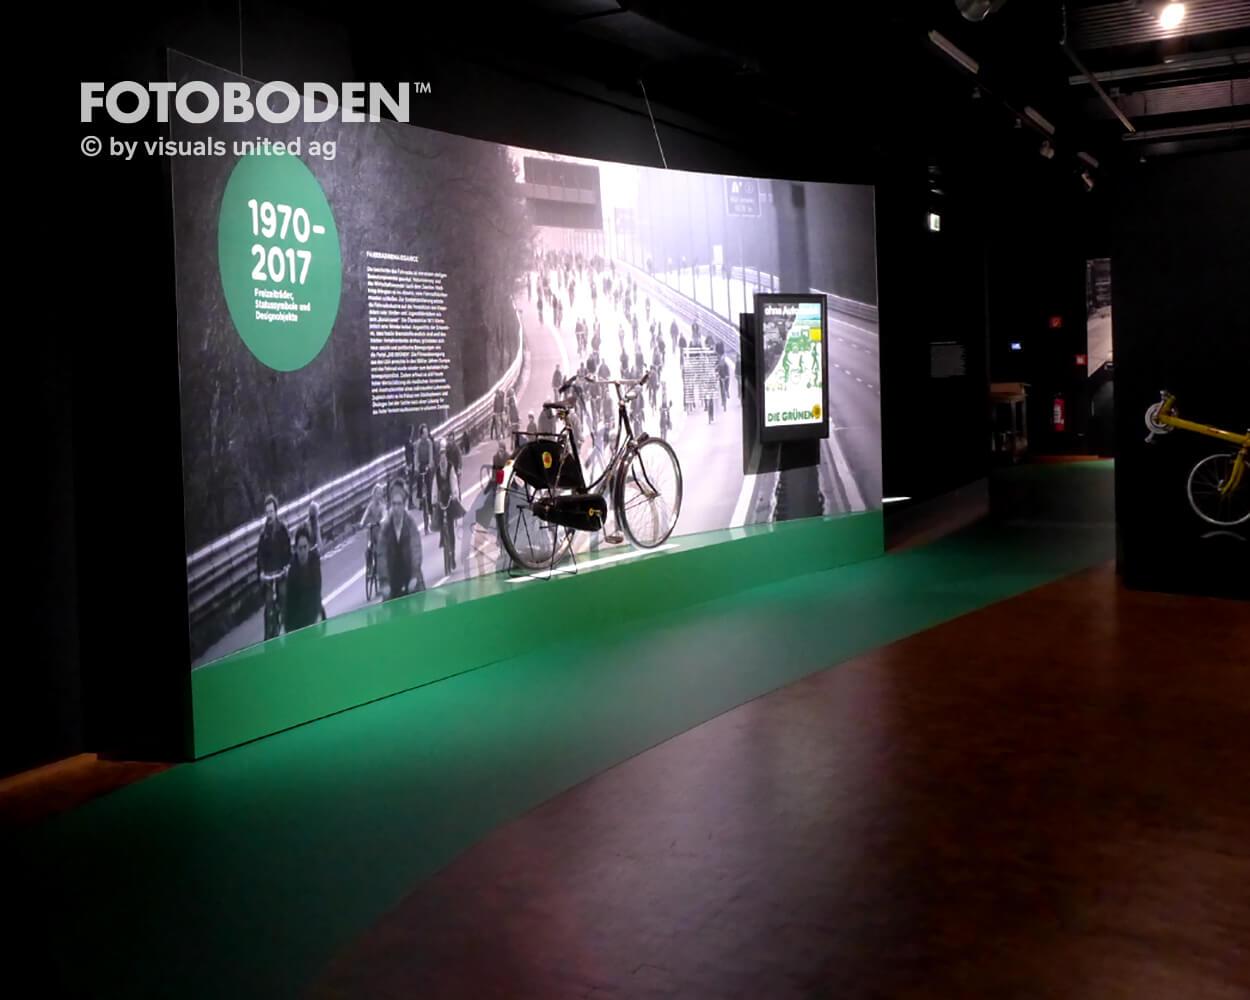 Fahrrad6 Ausstellung Museum  Raumkonzept Stimmung Museumsboden Ausstellungsboden Fotoboden Vinylboden Flooring Individuell Event